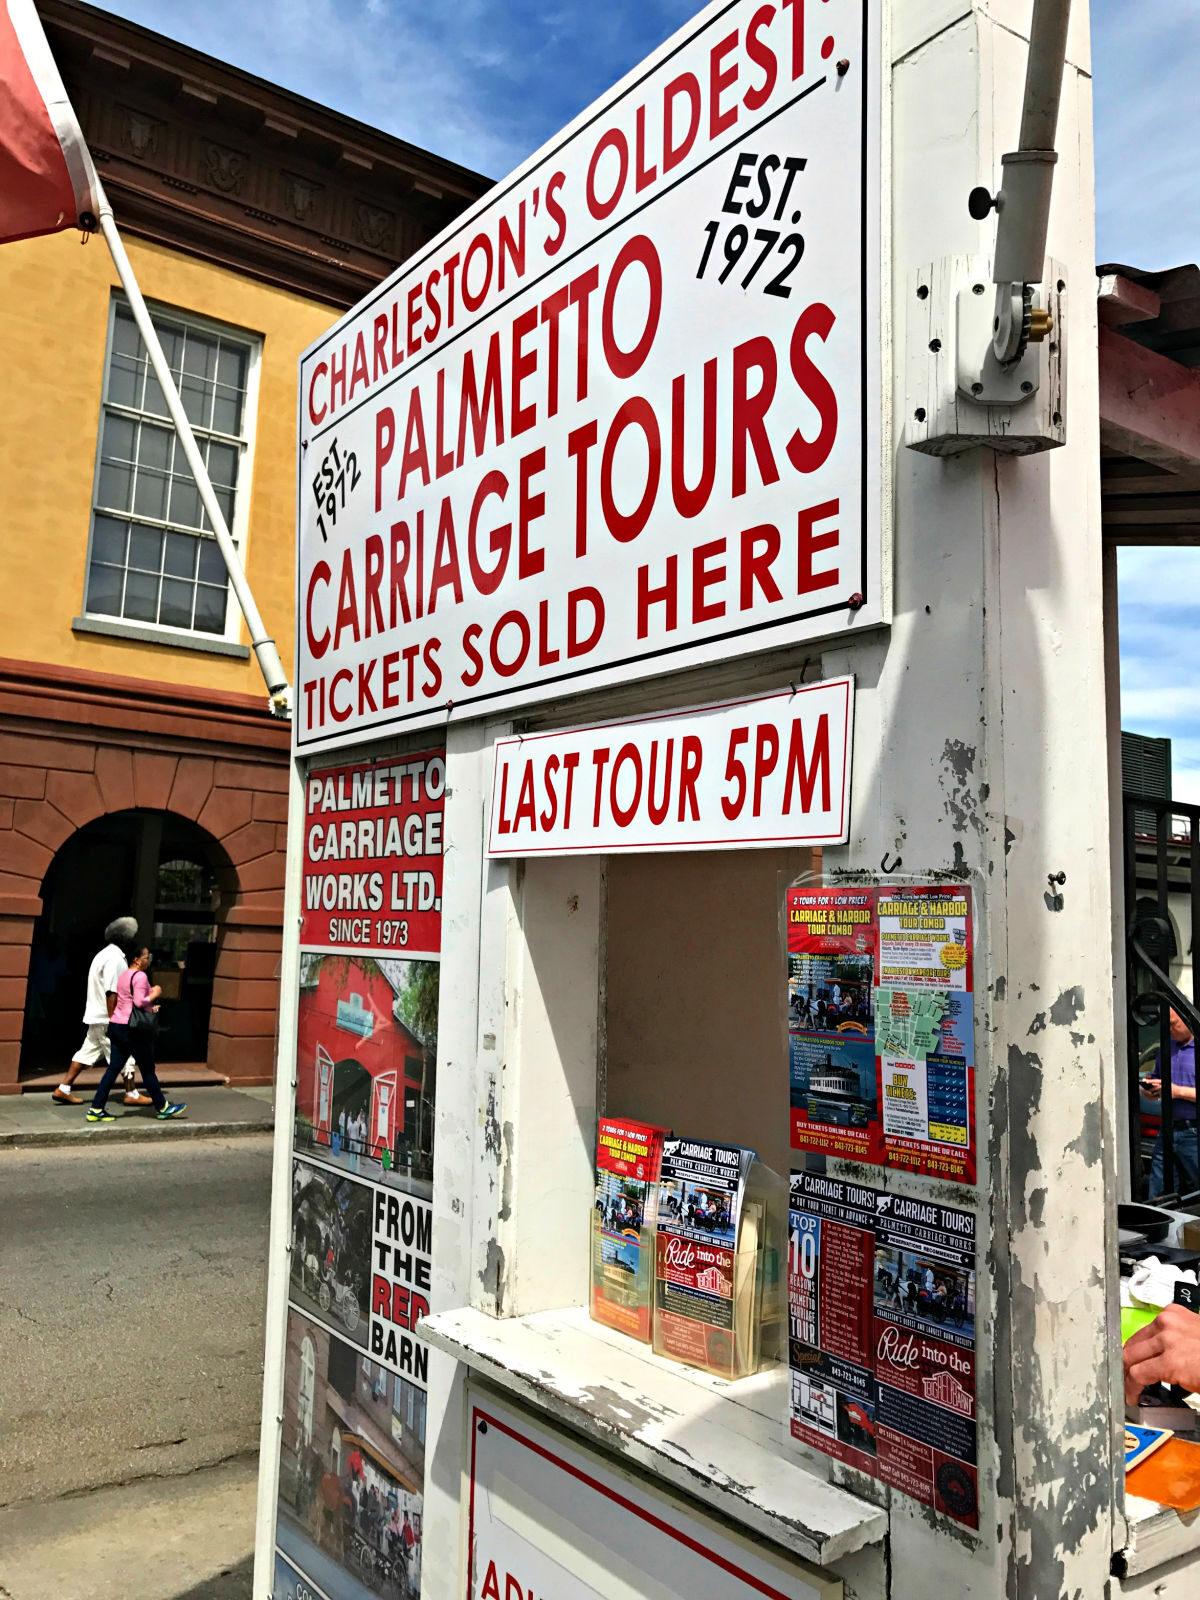 Palmetto Carriage Tours sign.